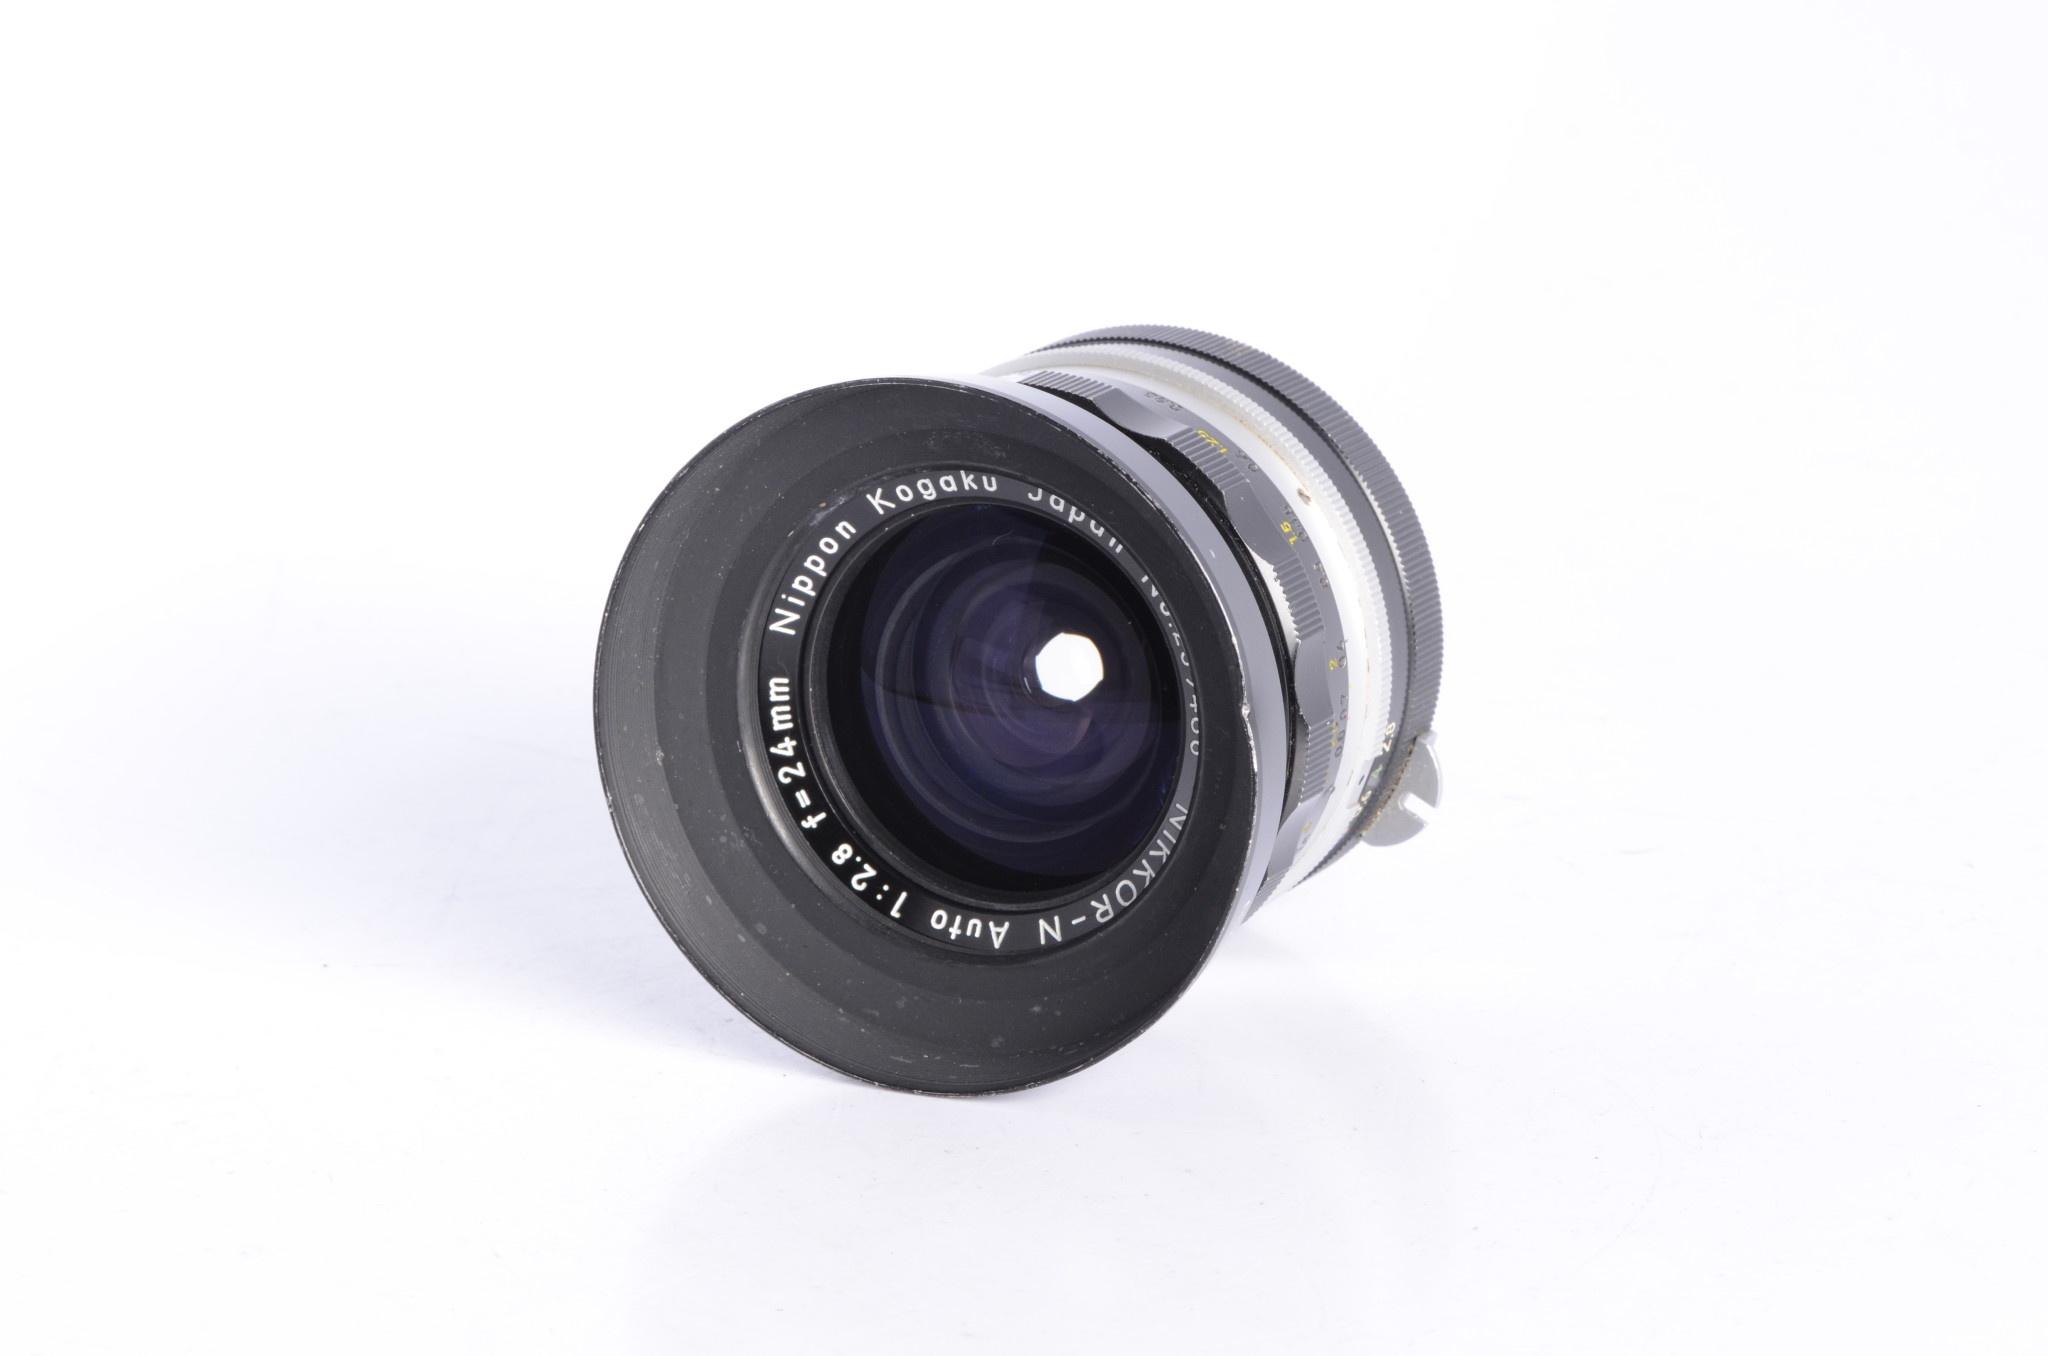 Nikon Nikon 24mm f/2.8 N Lens SN: 259486 *